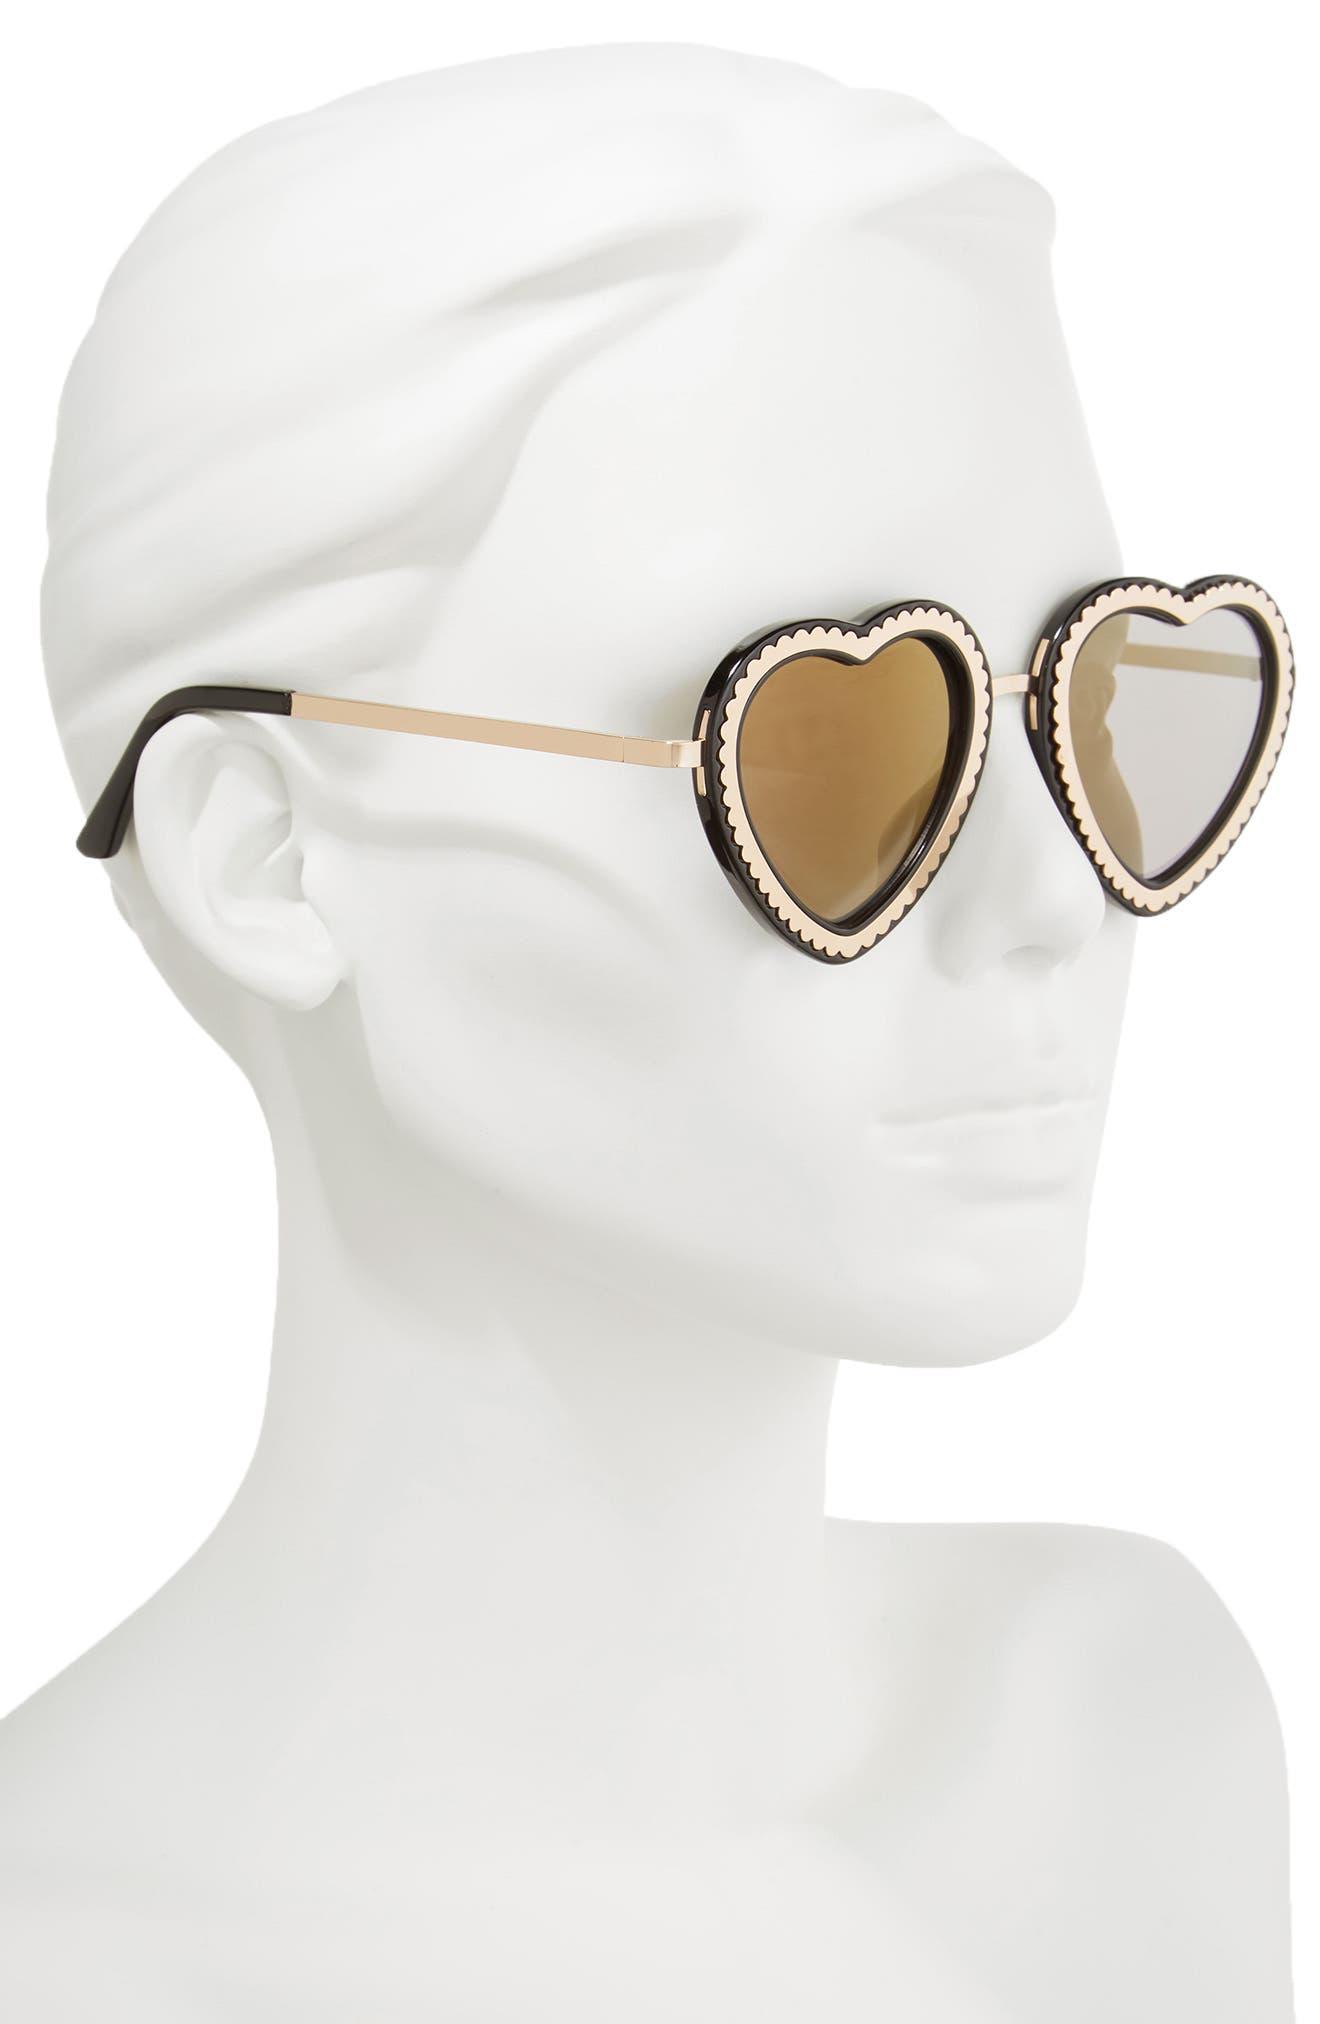 61mm Mirrored Heart Sunglasses,                             Alternate thumbnail 2, color,                             Gold/ Black